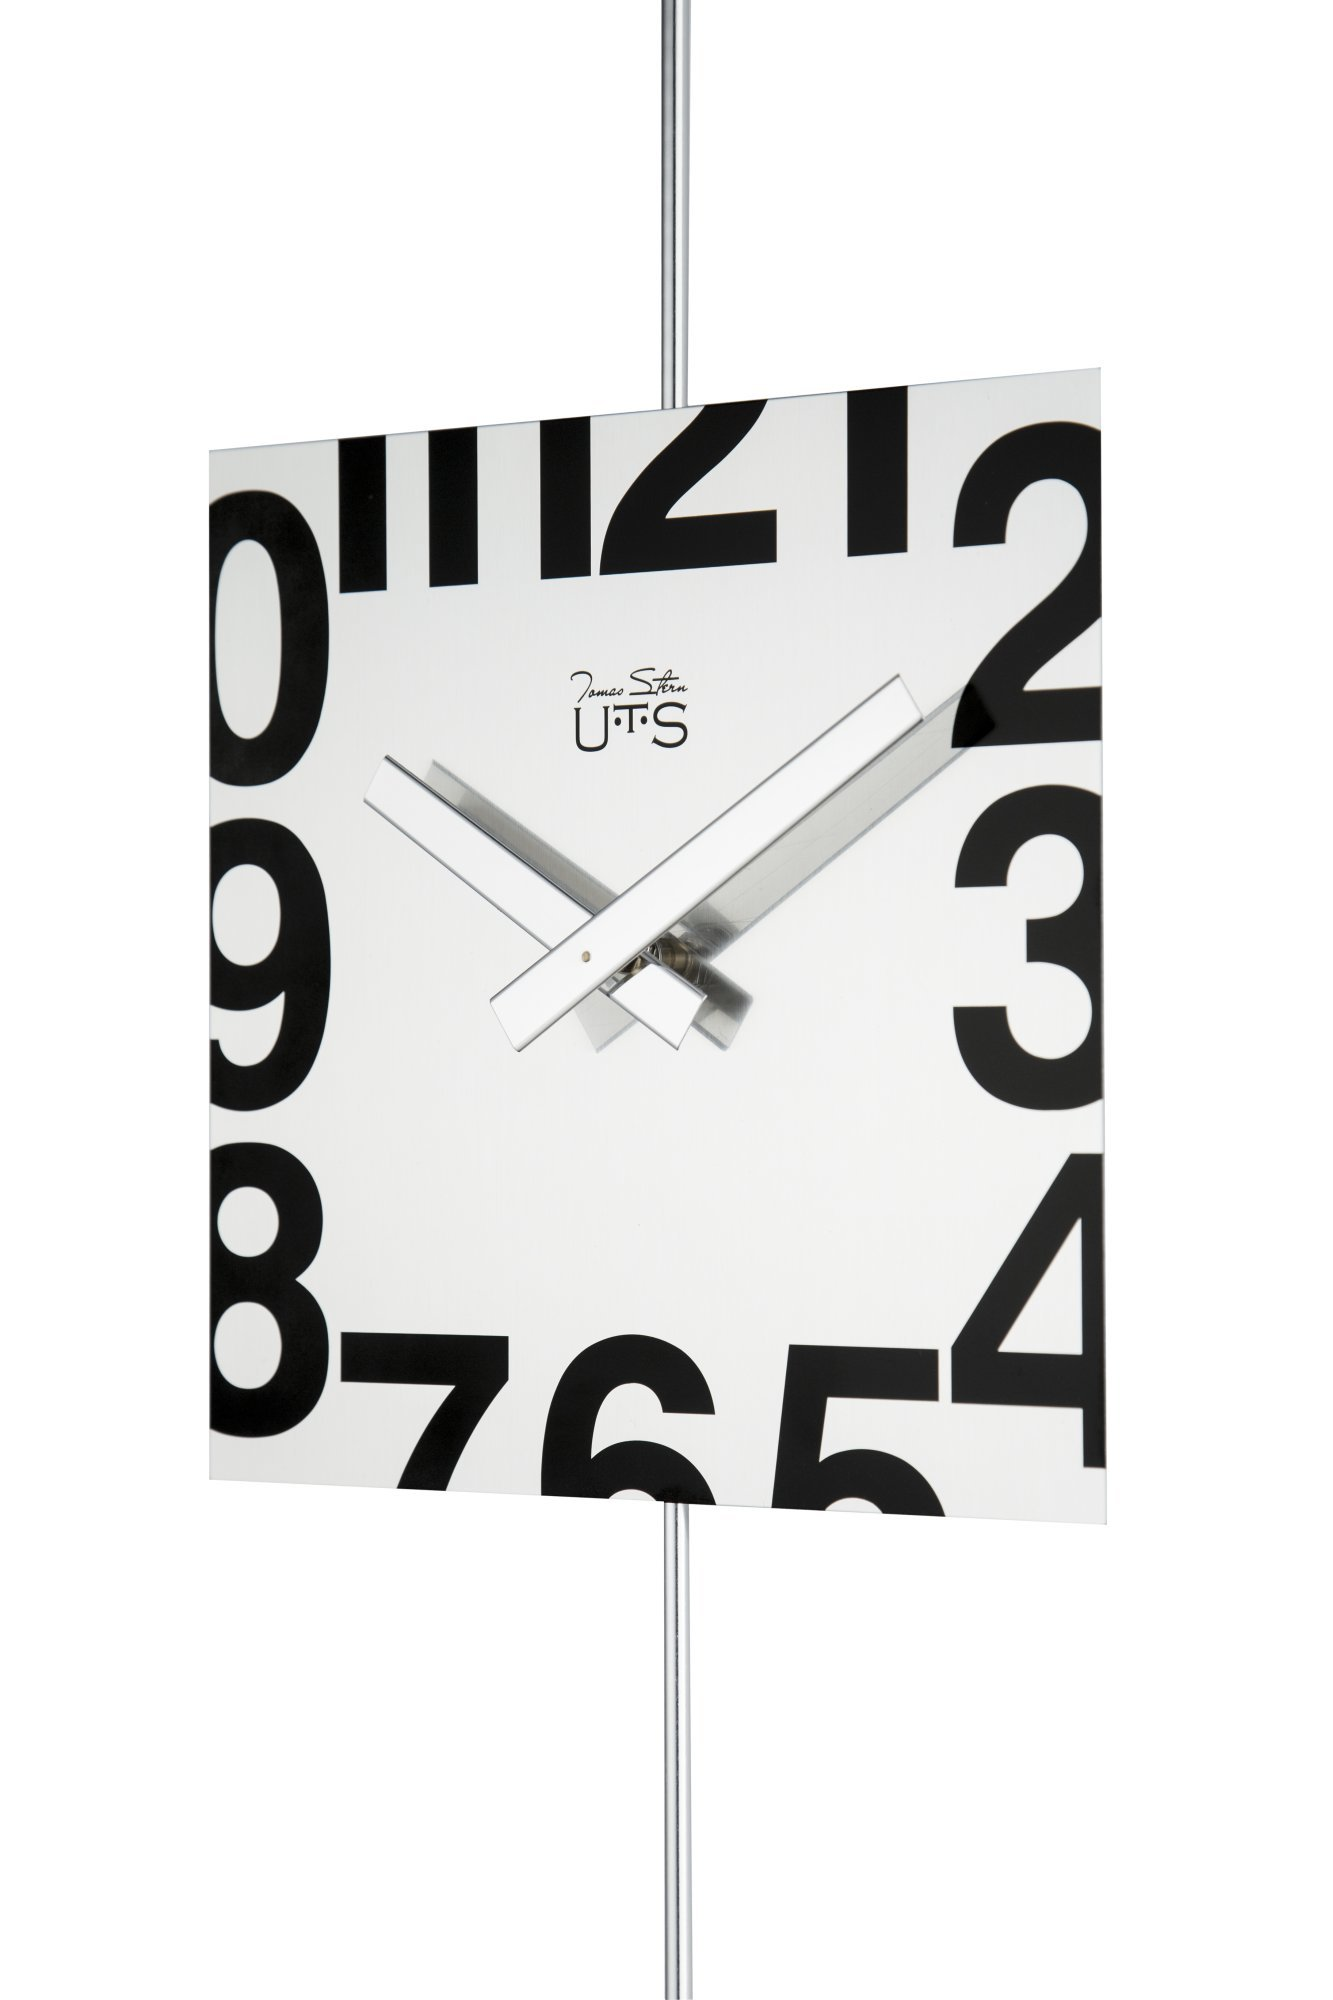 Часы настенные Часы настенные Tomas Stern 4021S chasy-nastennye-tomas-stern-4021s-germaniya.jpg